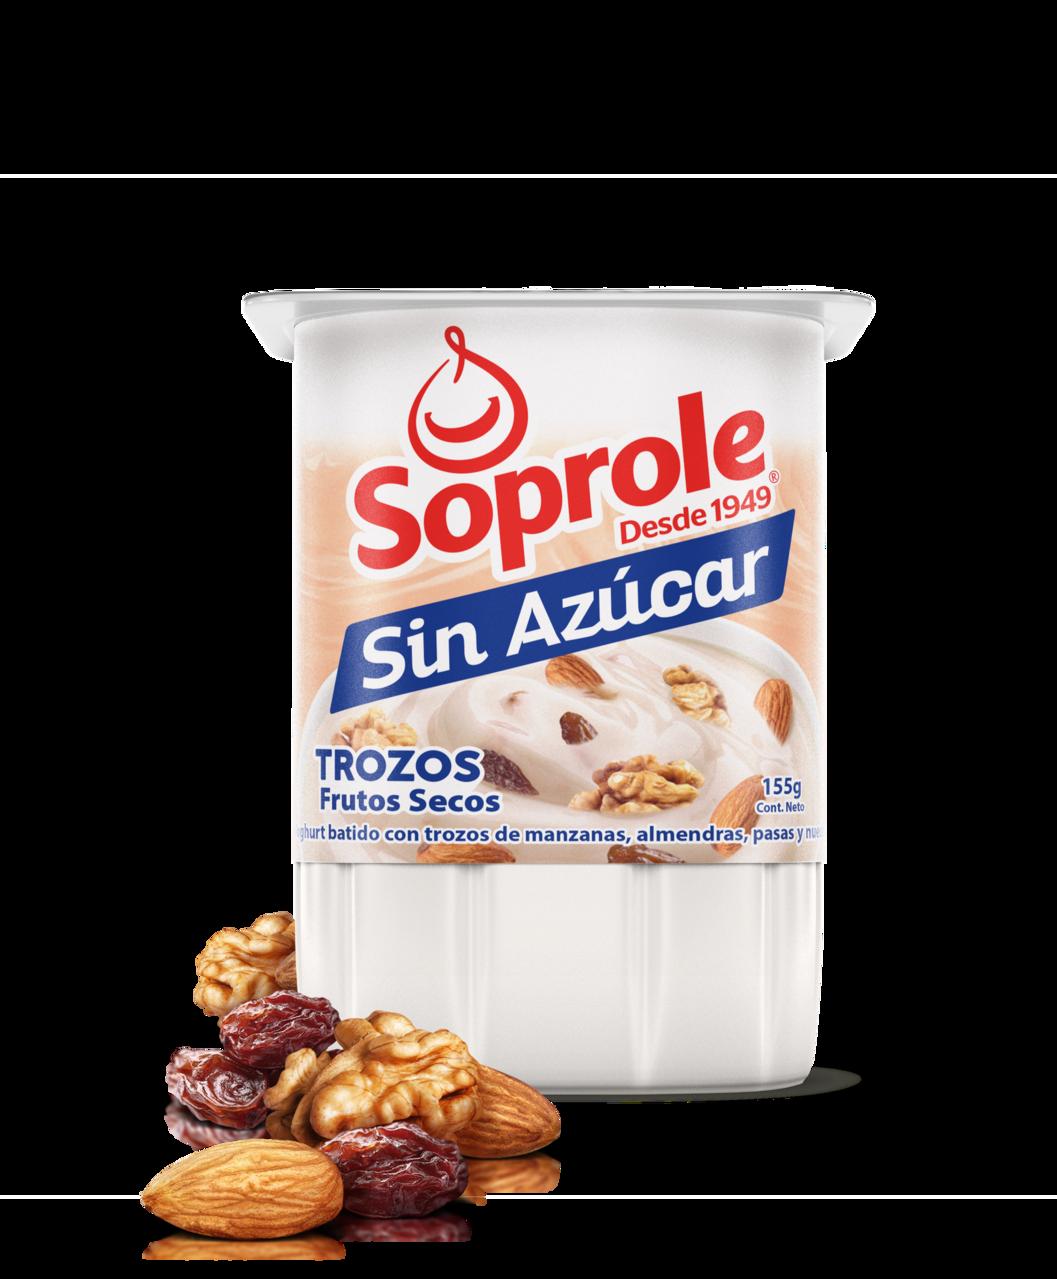 Soprole Sin Azúcar Yoghurt trozos frutos secos